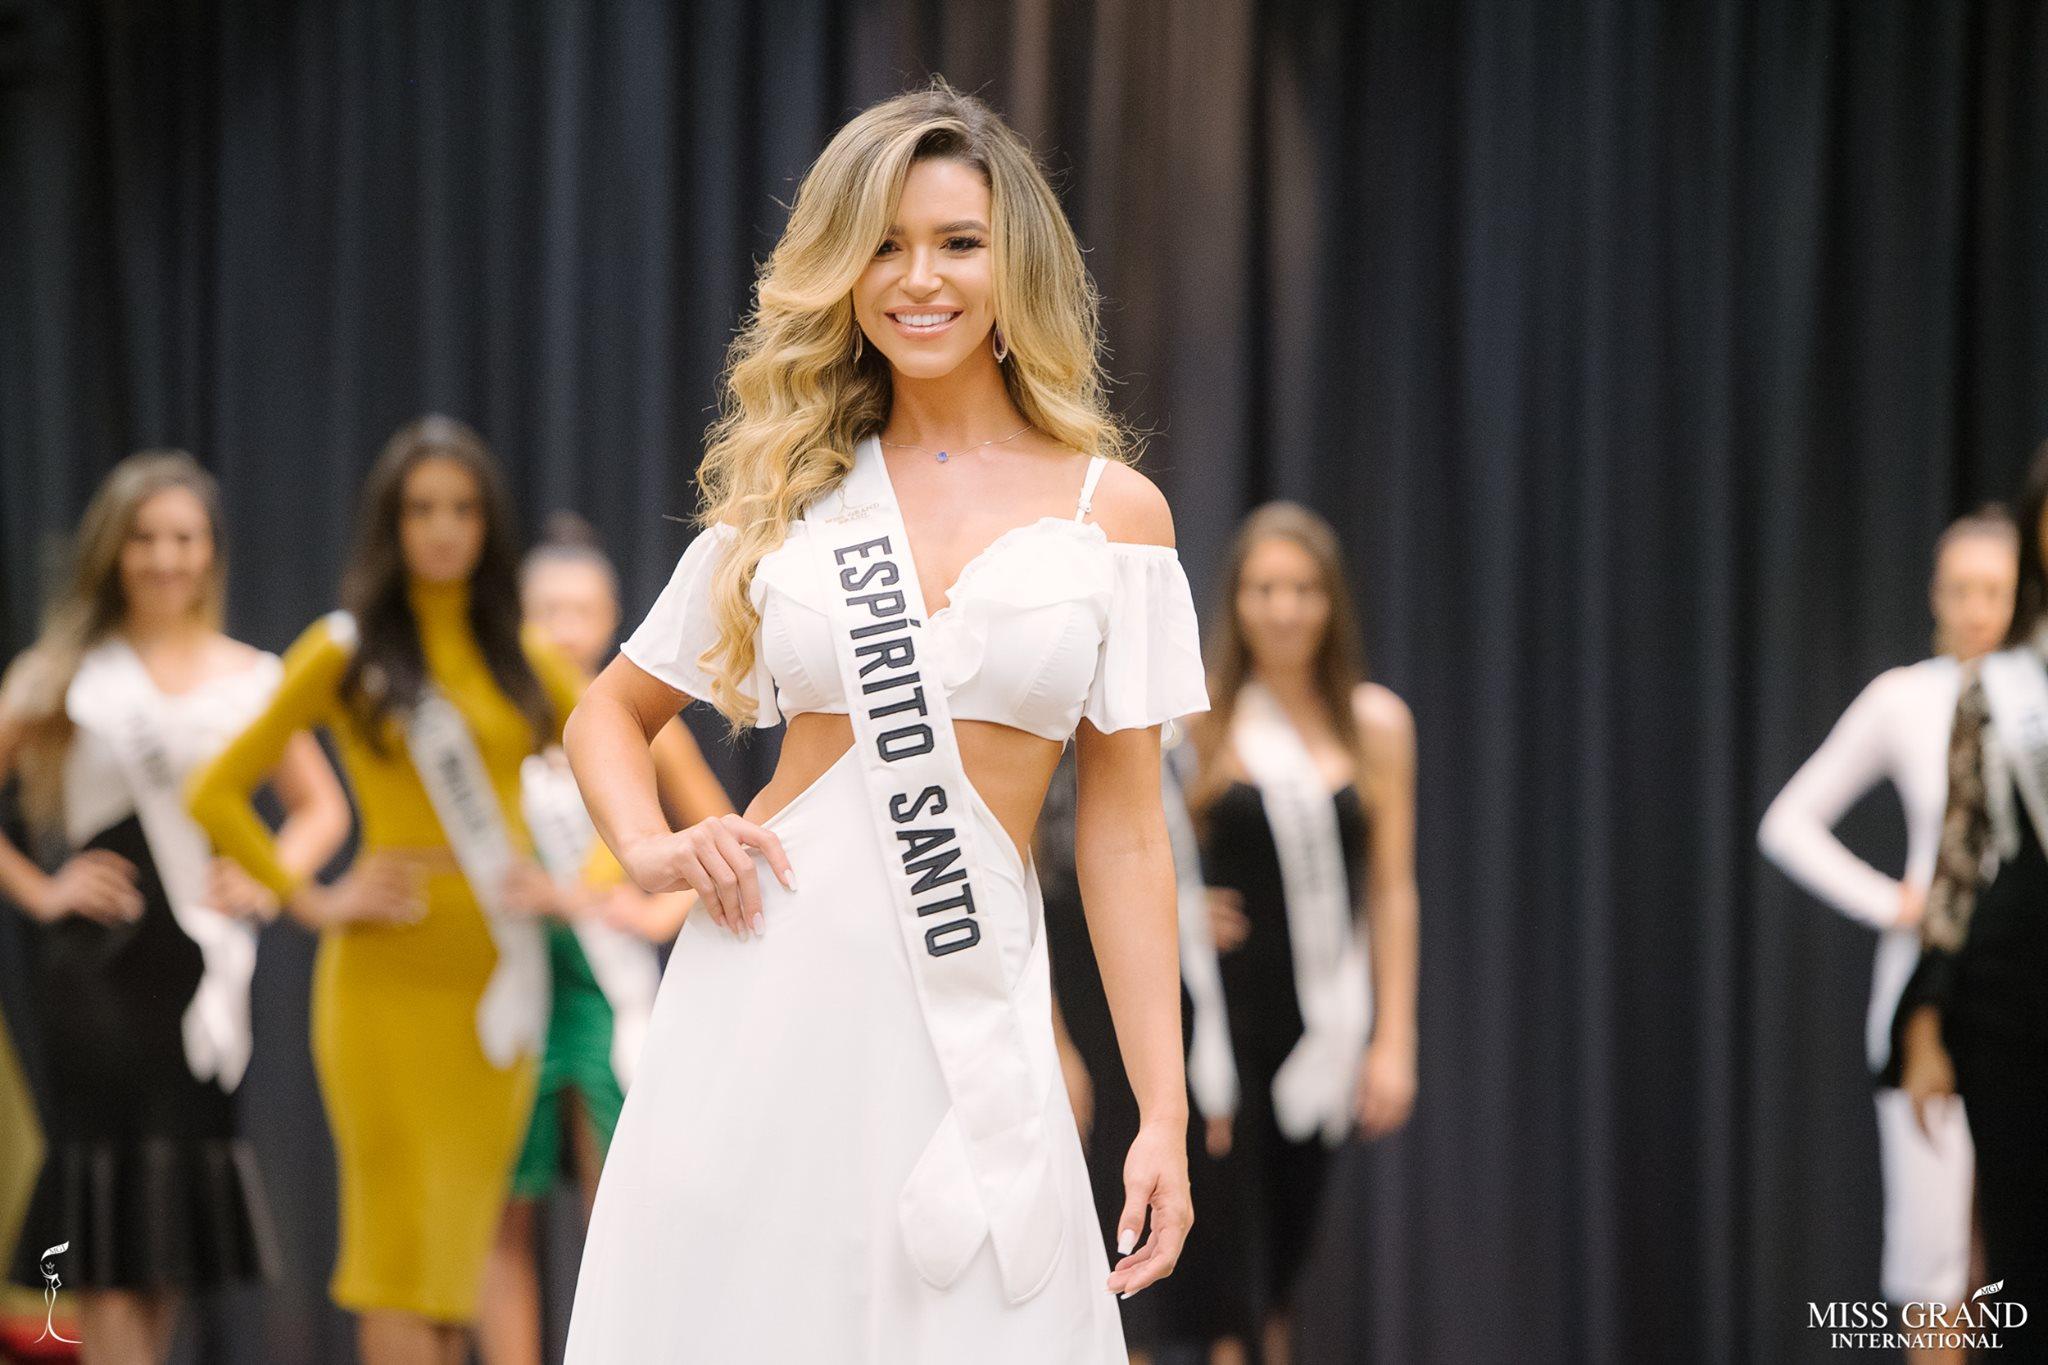 amanda cardoso, miss grand espirito santo 2019/3rd runner-up de miss intercontinental 2017. - Página 16 Alex-p53